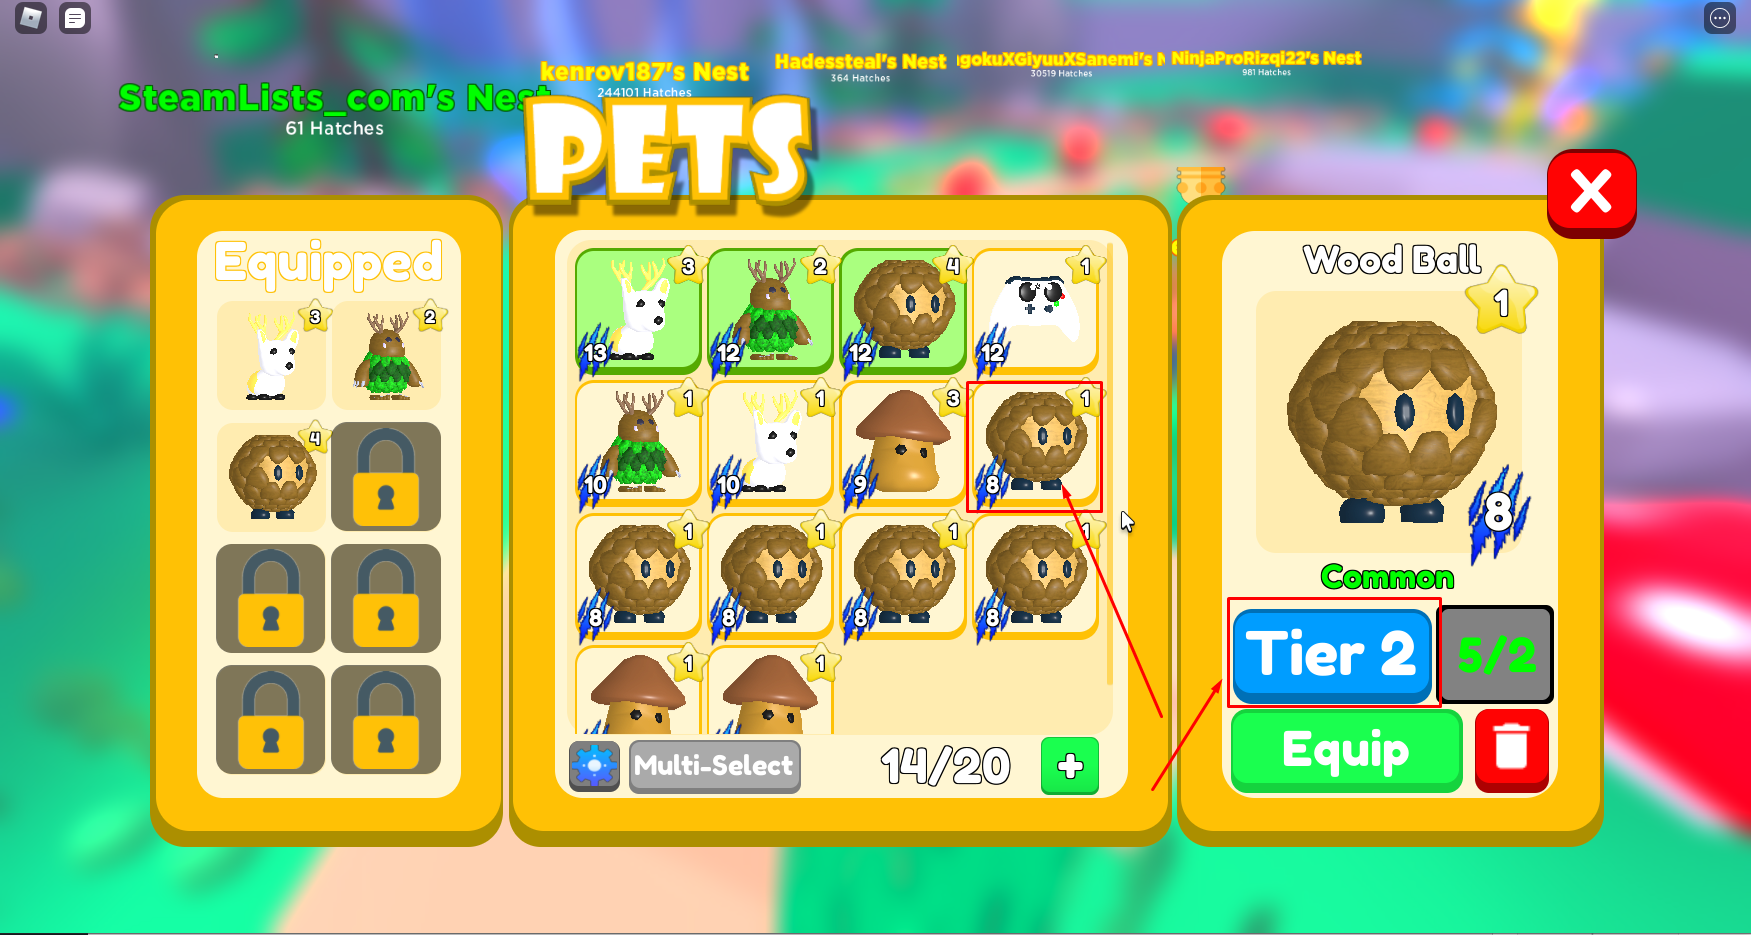 Roblox – Pet Swarm Simulator How to upgrade Pets and make them stronger 2 - steamlists.com